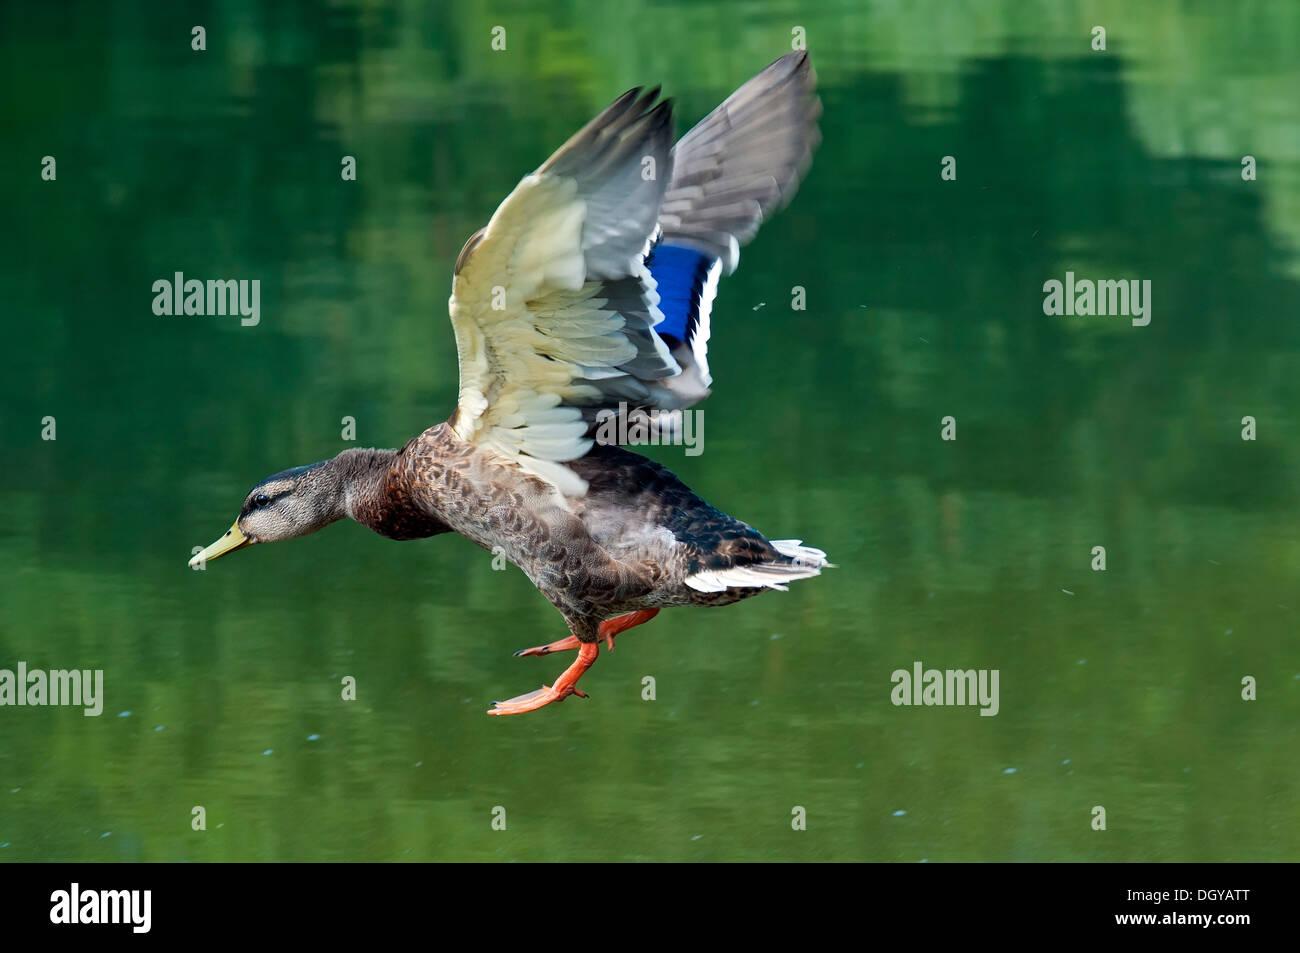 Mallard Duck, Flying, - Stock Image